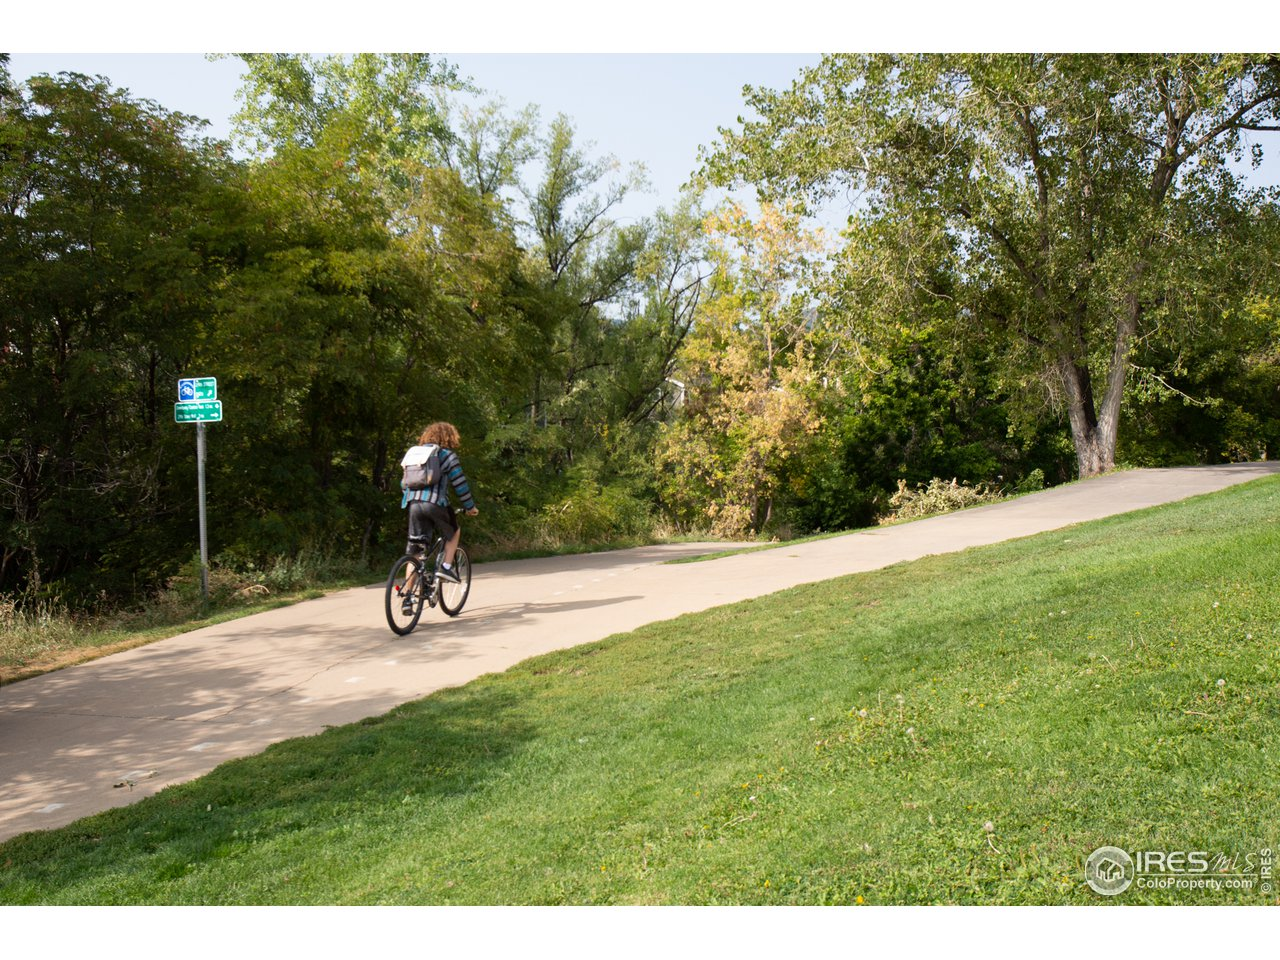 Close to walk/bike path and park